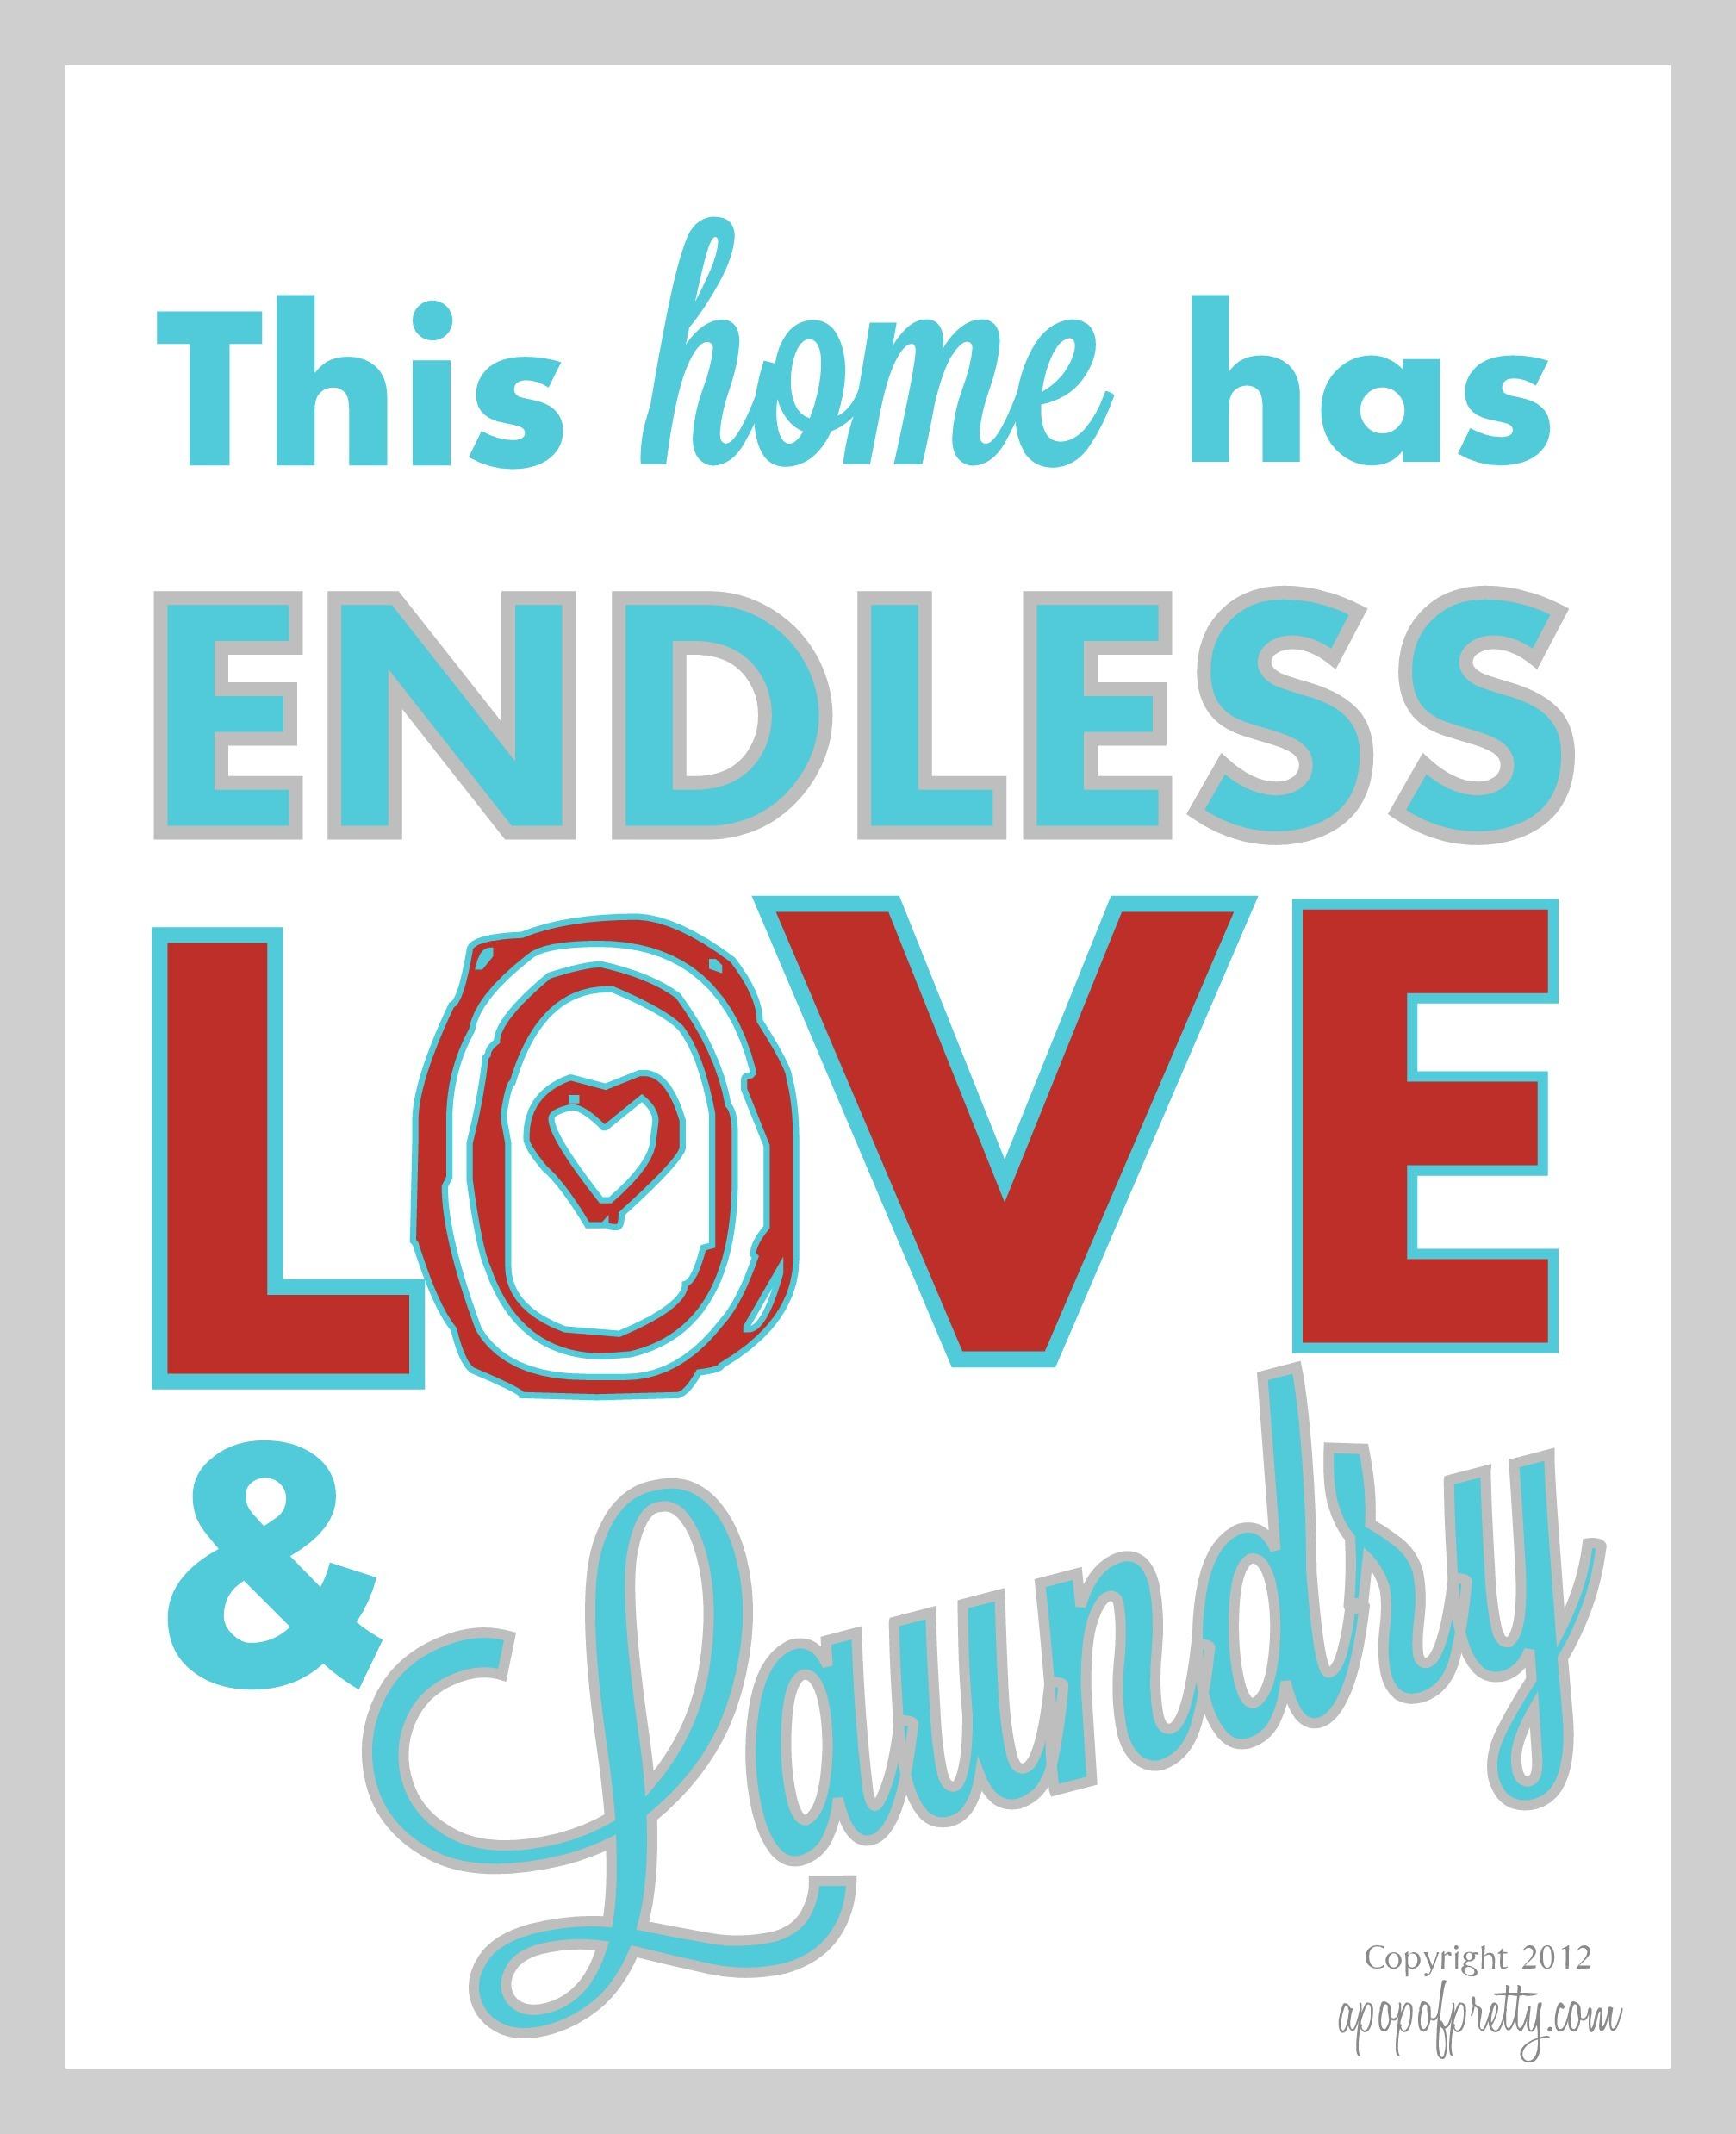 diy artwork - Love and Laundry